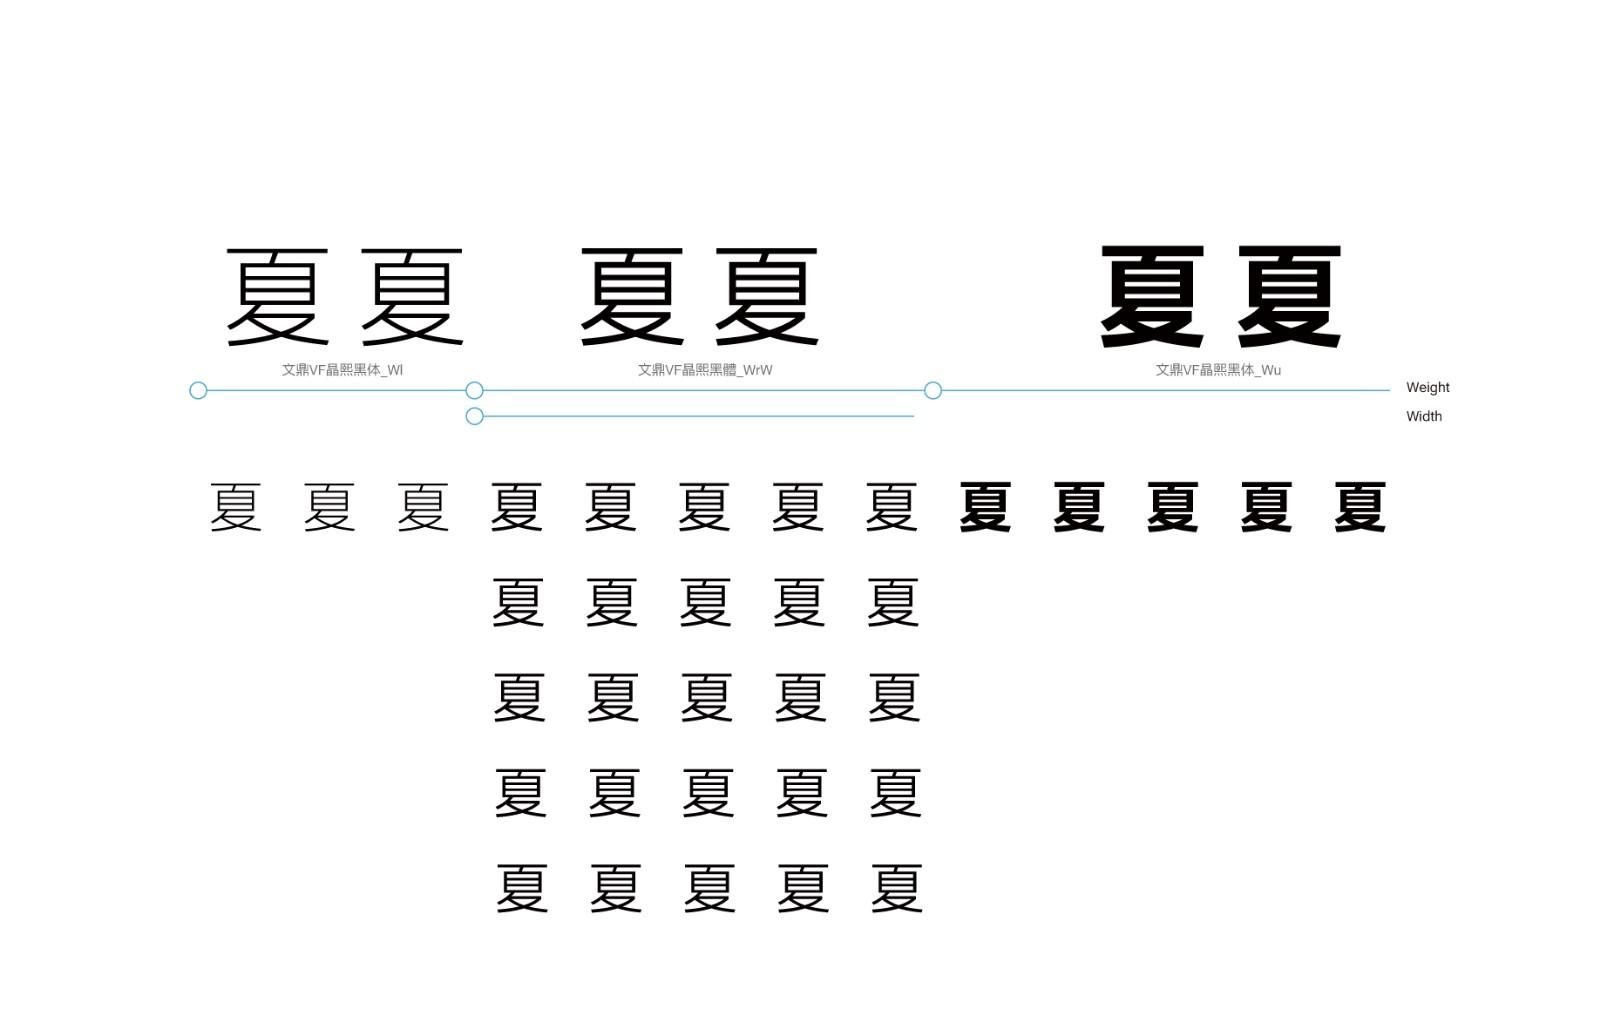 https://ft-bk1.oss-cn-zhangjiakou.aliyuncs.com/Public/Uploads/img/n_content_20201210110430_9936.jpg